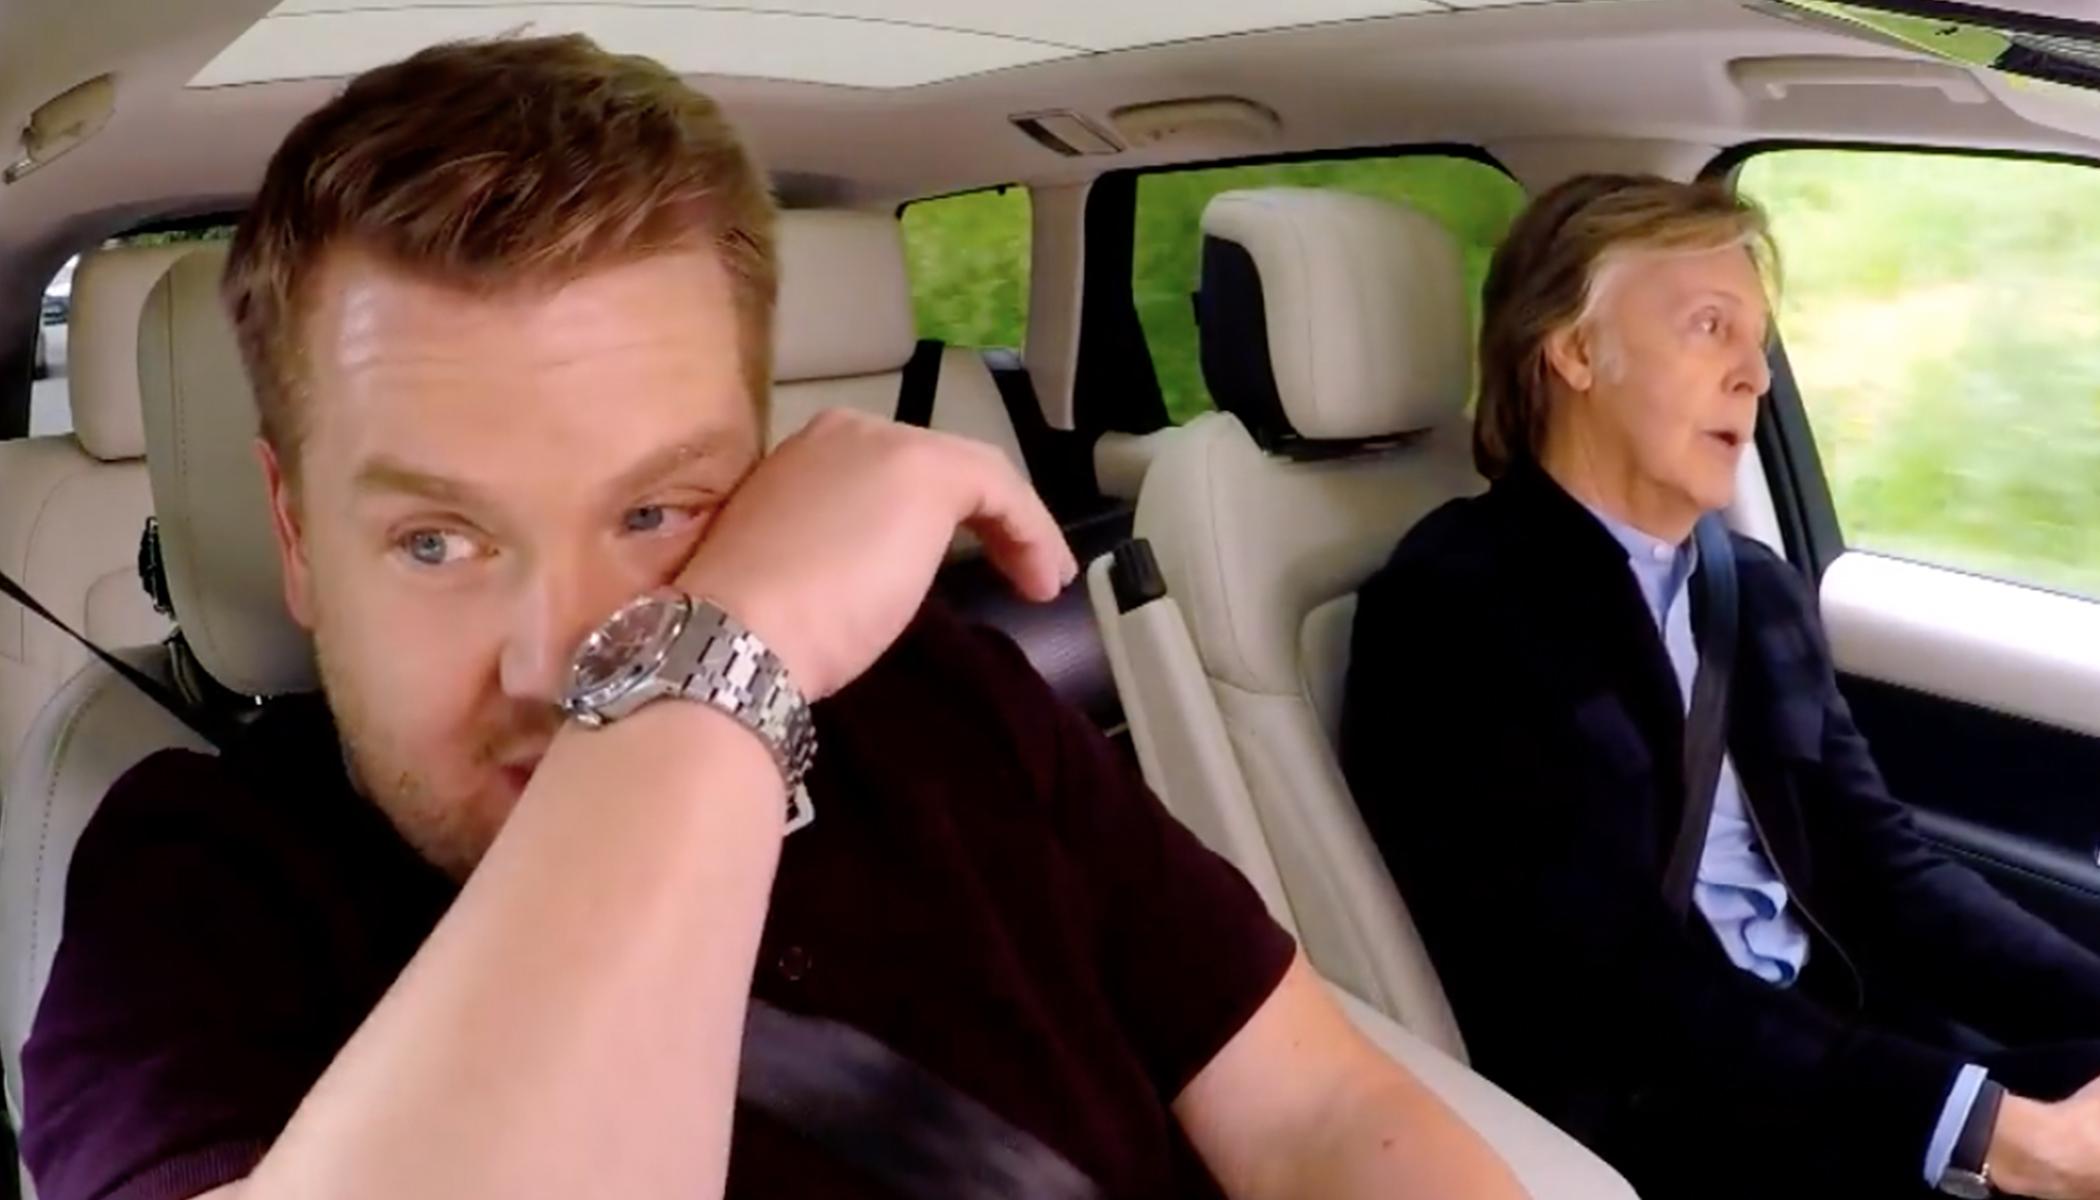 James Corden Left in Tears as Paul McCartney Reveals Incredible Story Behind 'Let it Be'